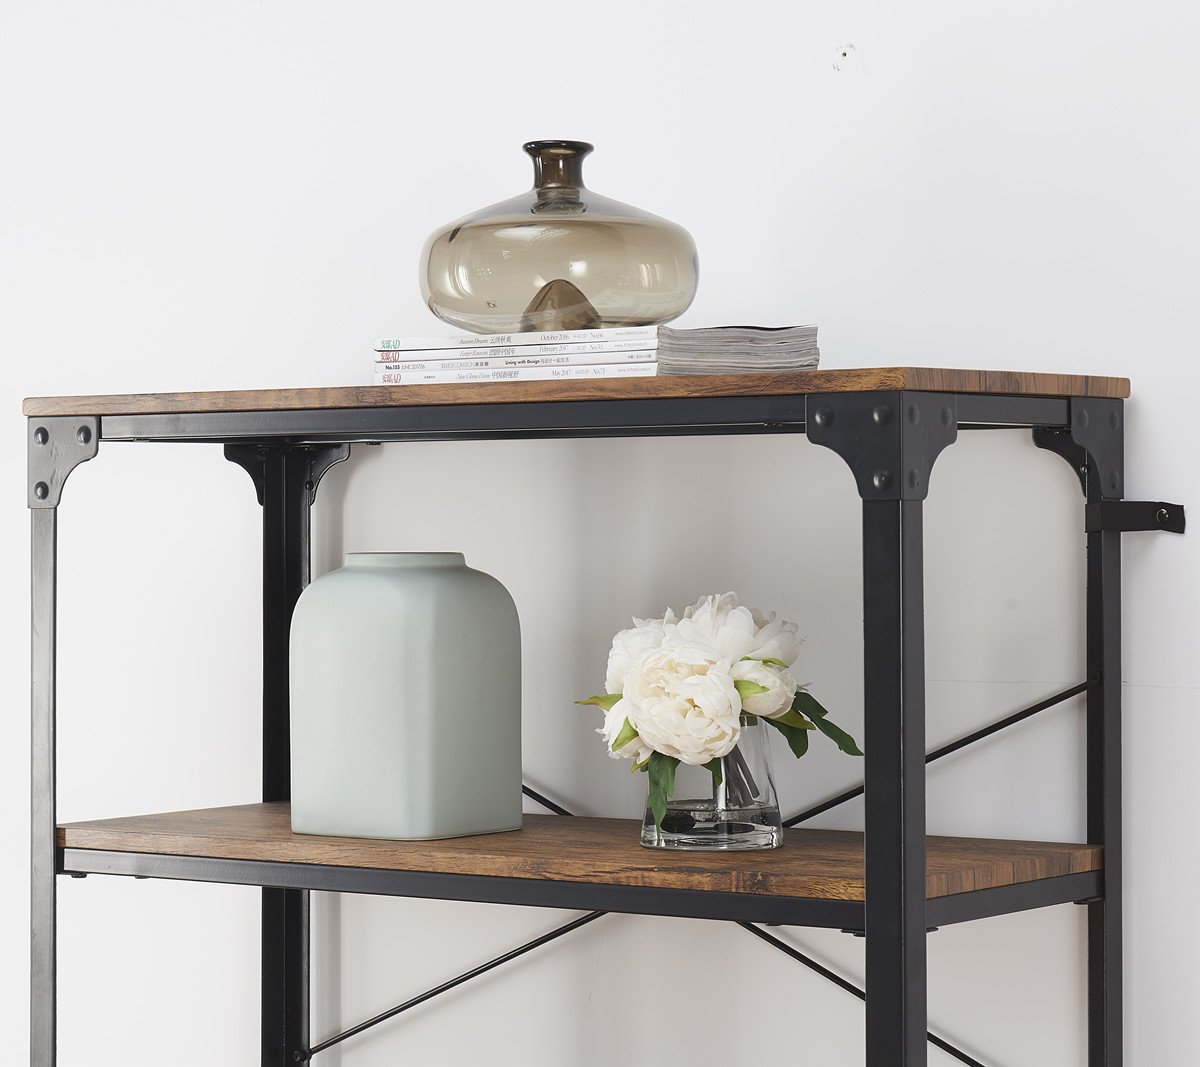 "O&K Furniture 4-Shelf Industrial Vintage Bookcase, Metal Bookshelf, 48""H x 33""W x 13""D, Barn-Wood Finish by O&K Furniture (Image #7)"